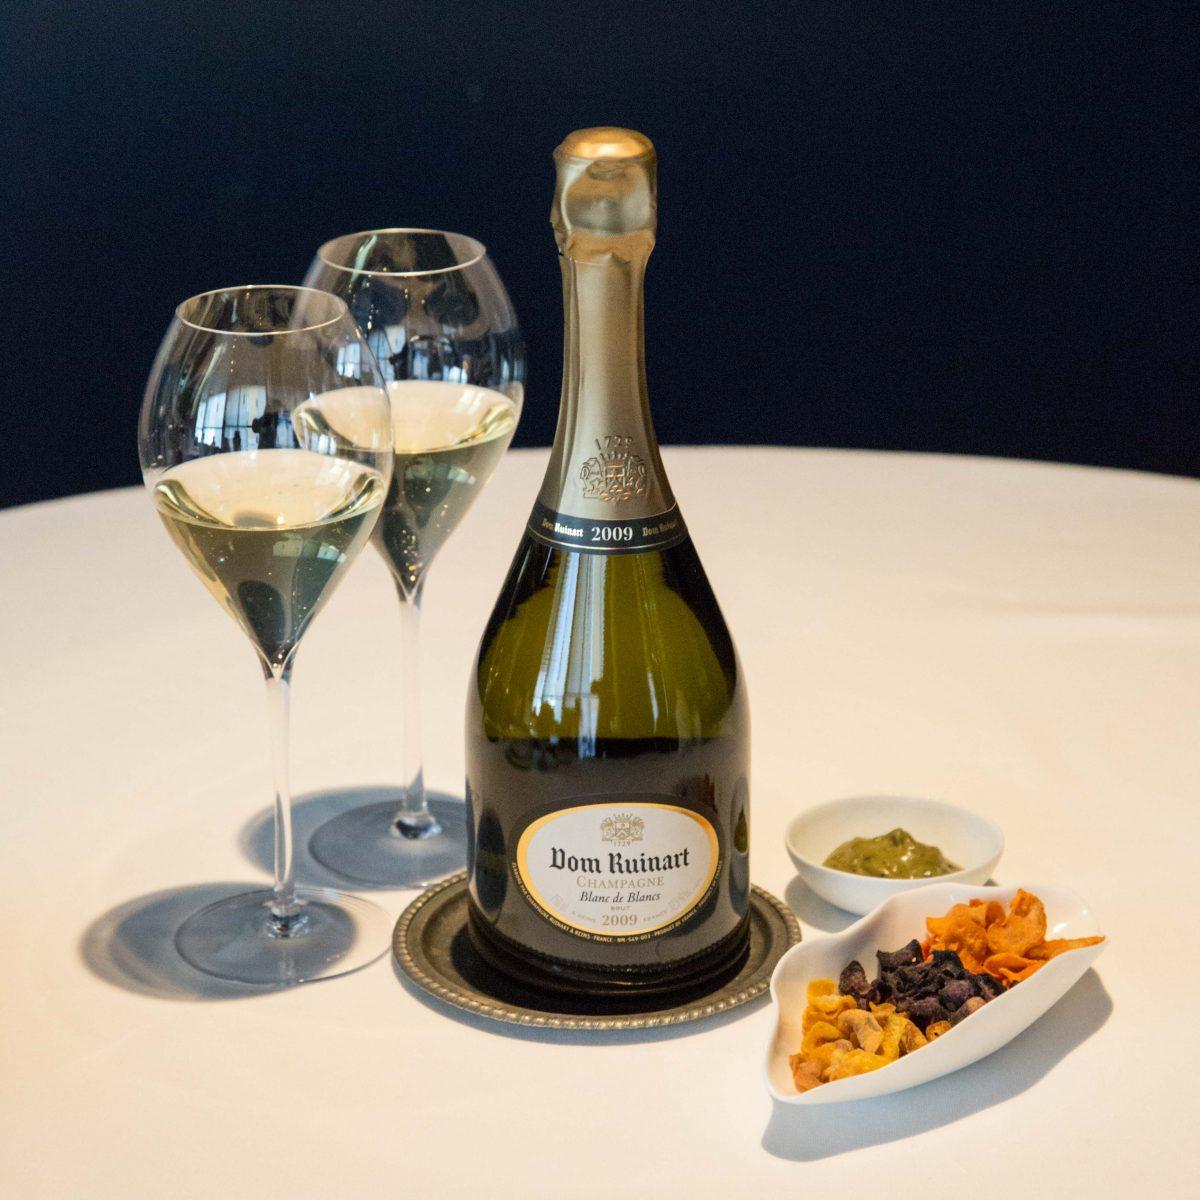 Champagne Dom Ruinart Blanc de Blancs 2009